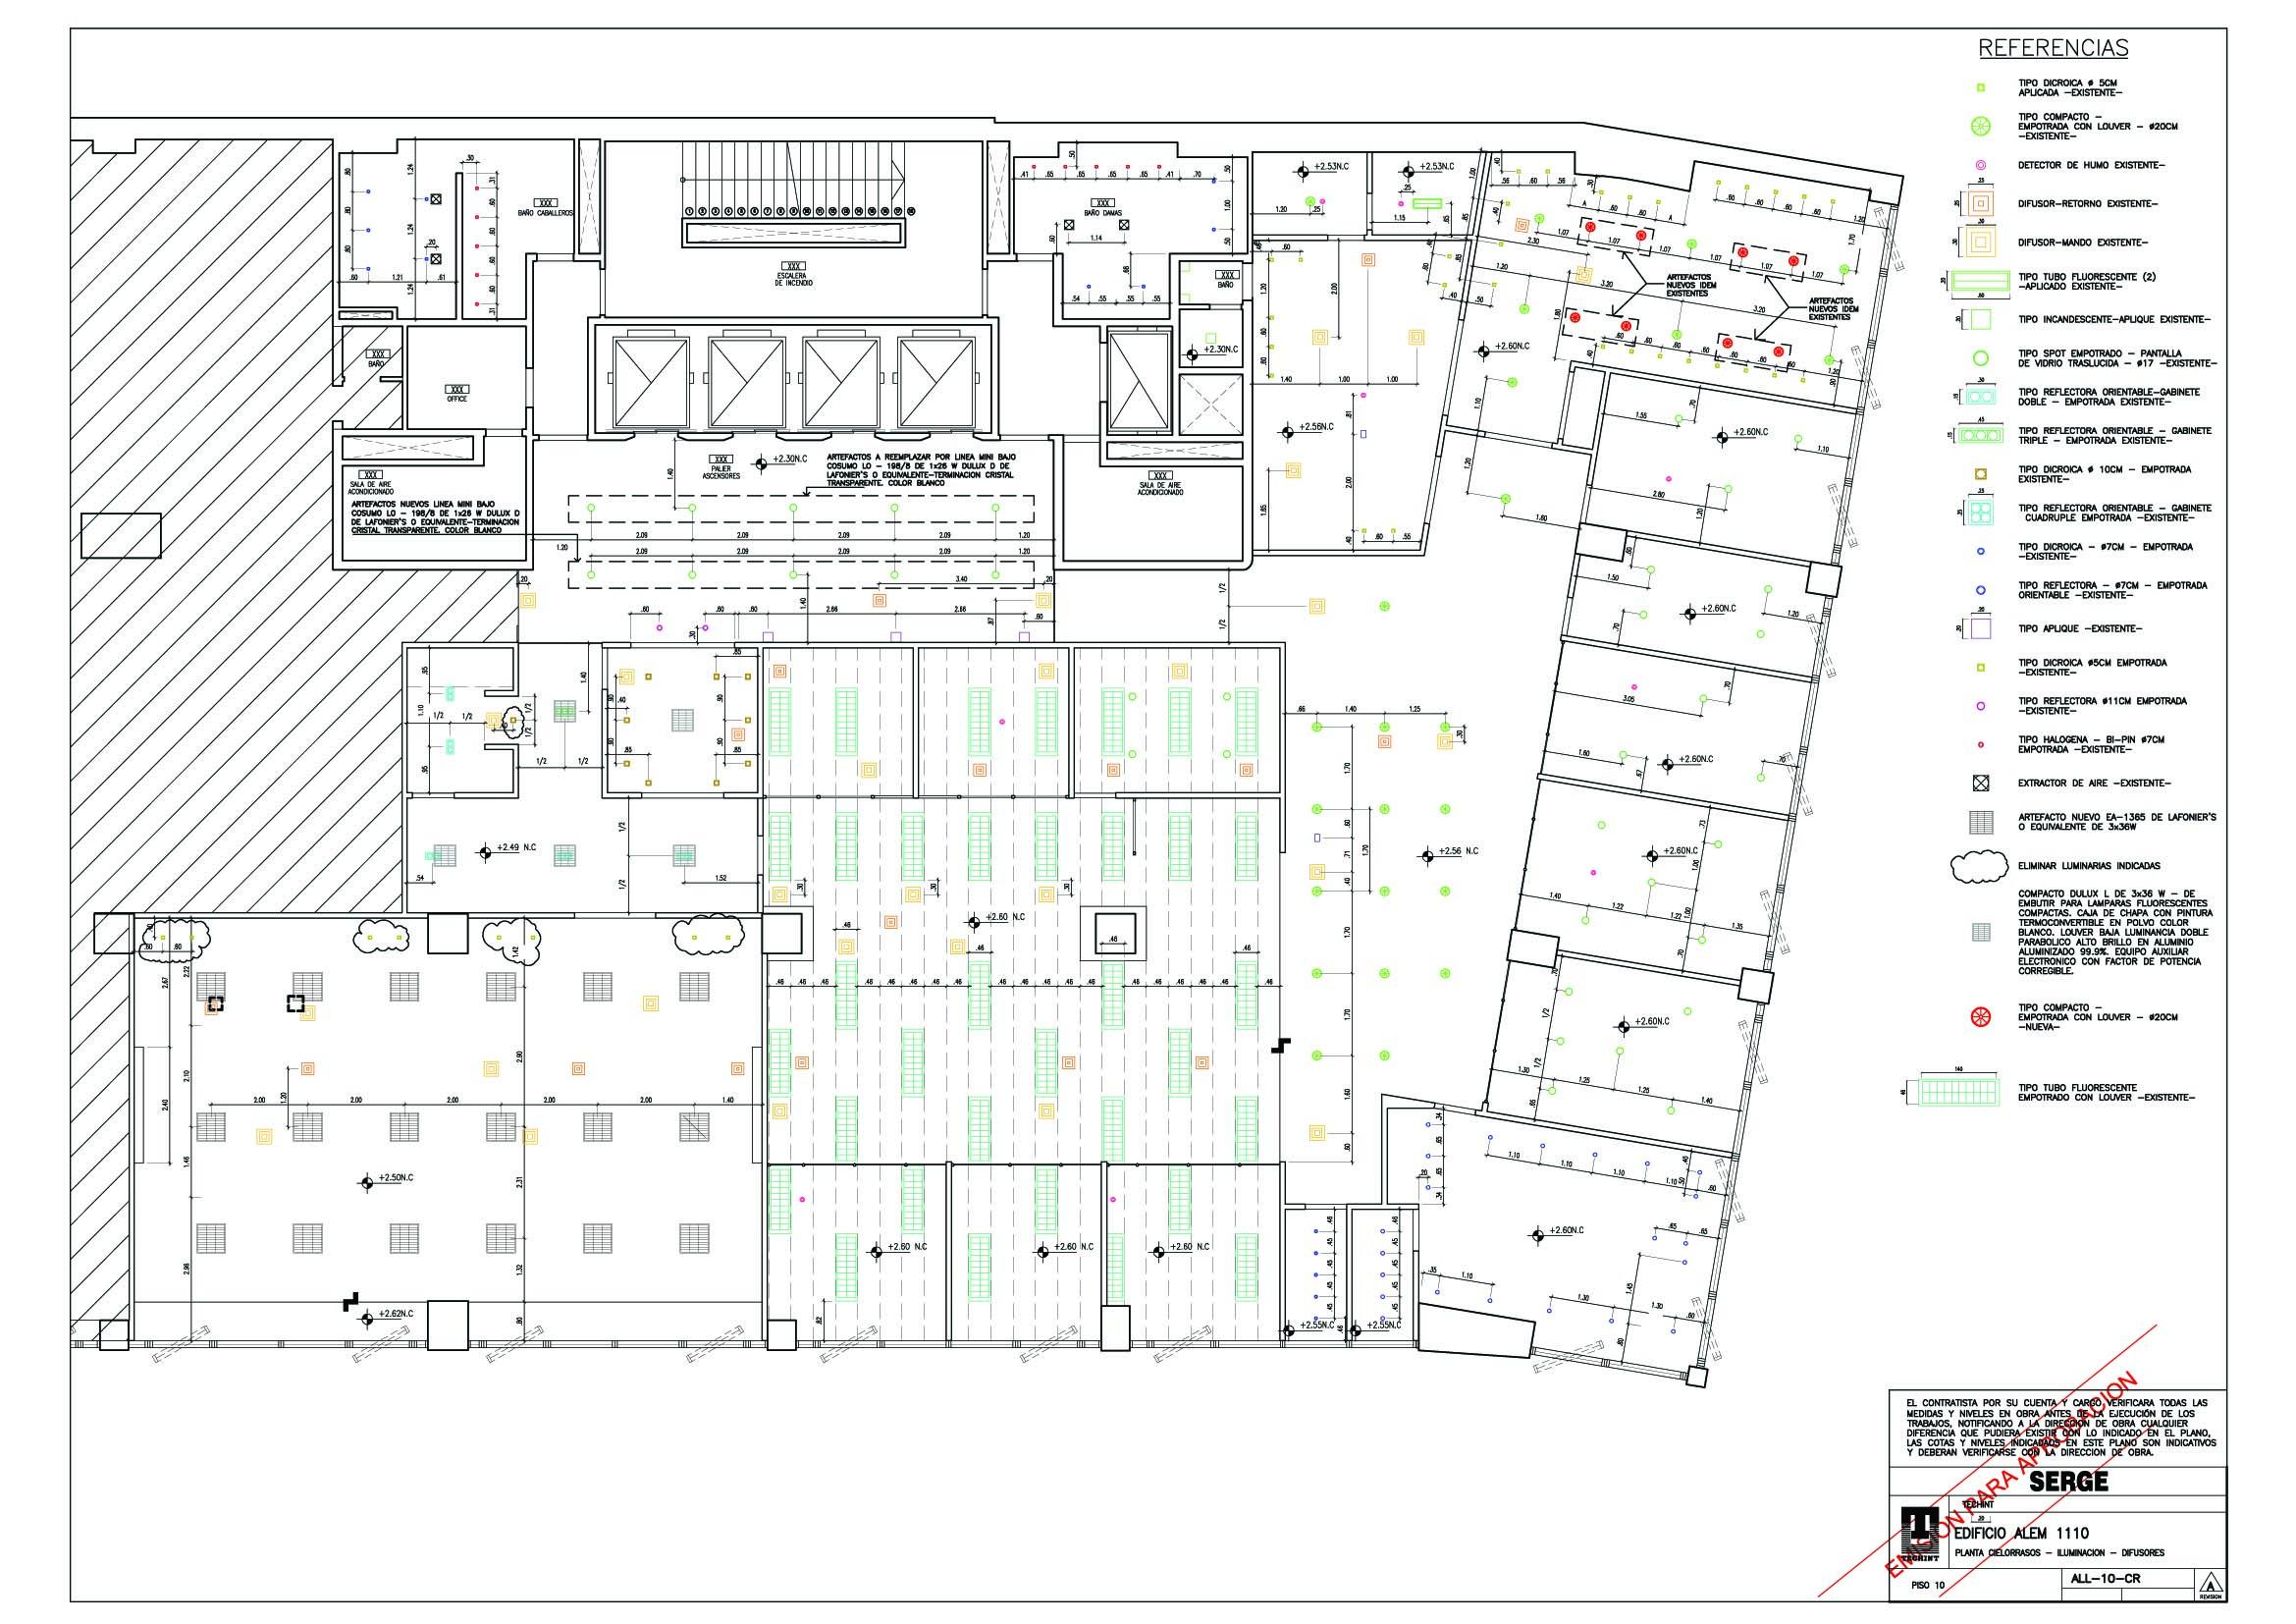 Oficinas for Oficinas planta arquitectonica